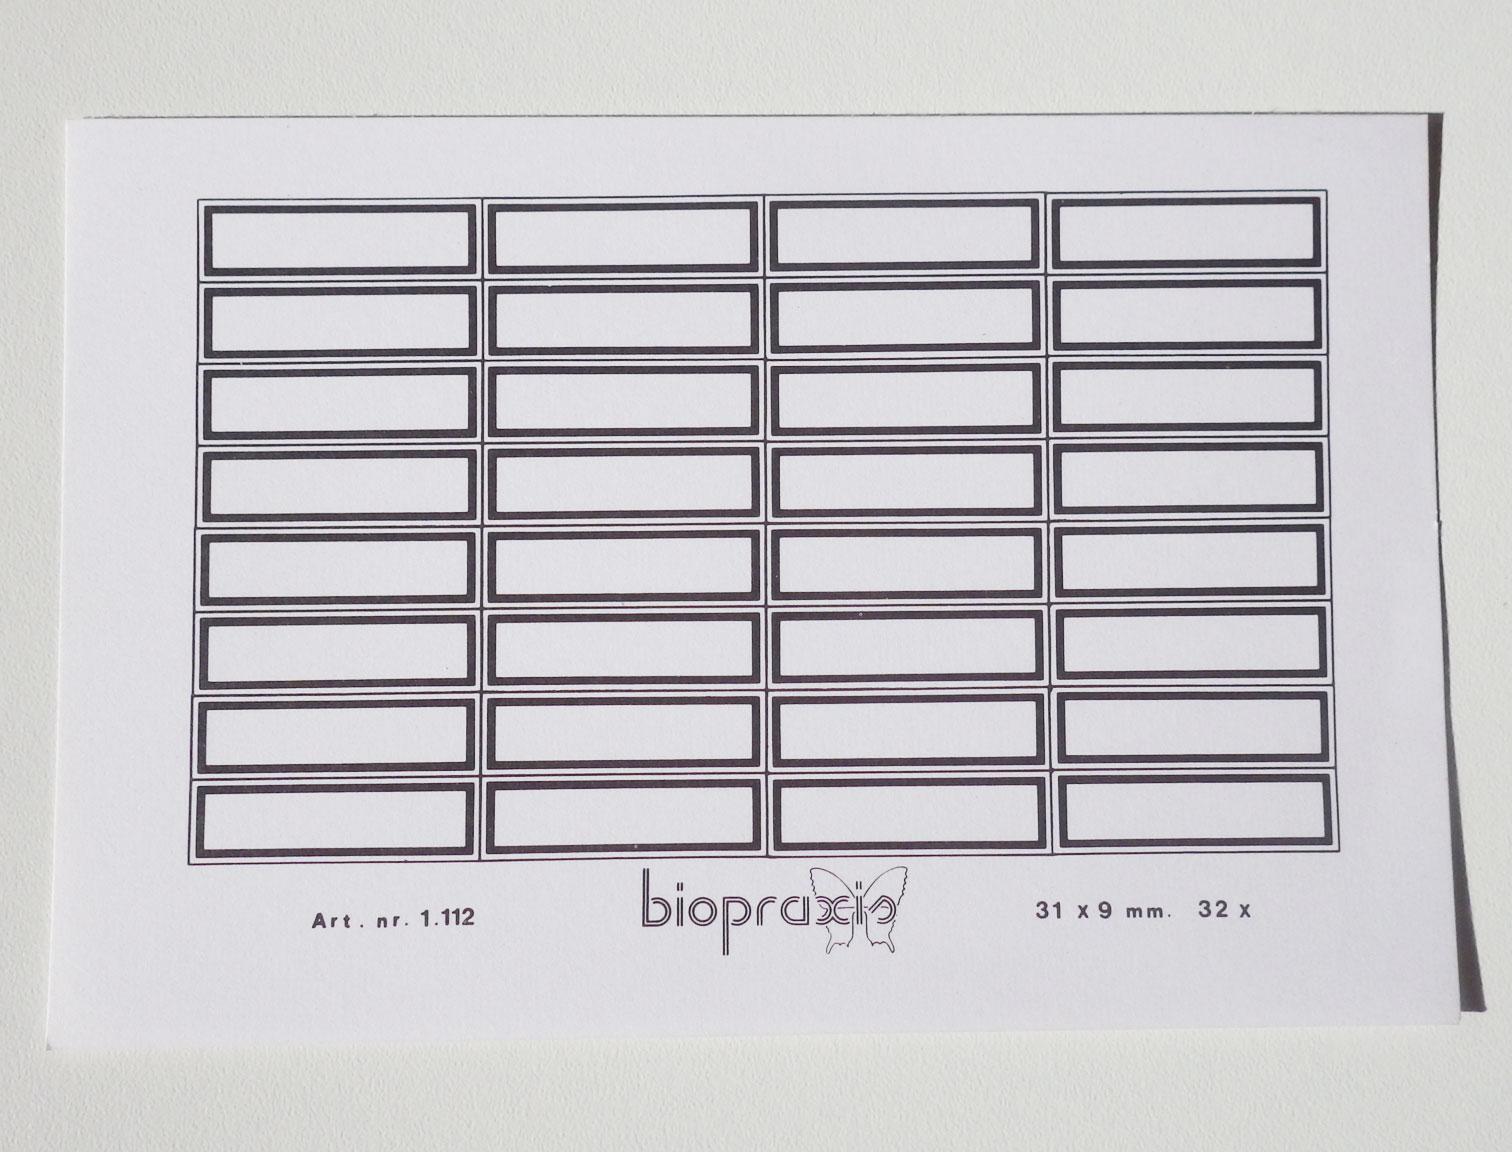 biopraxis-31-x9